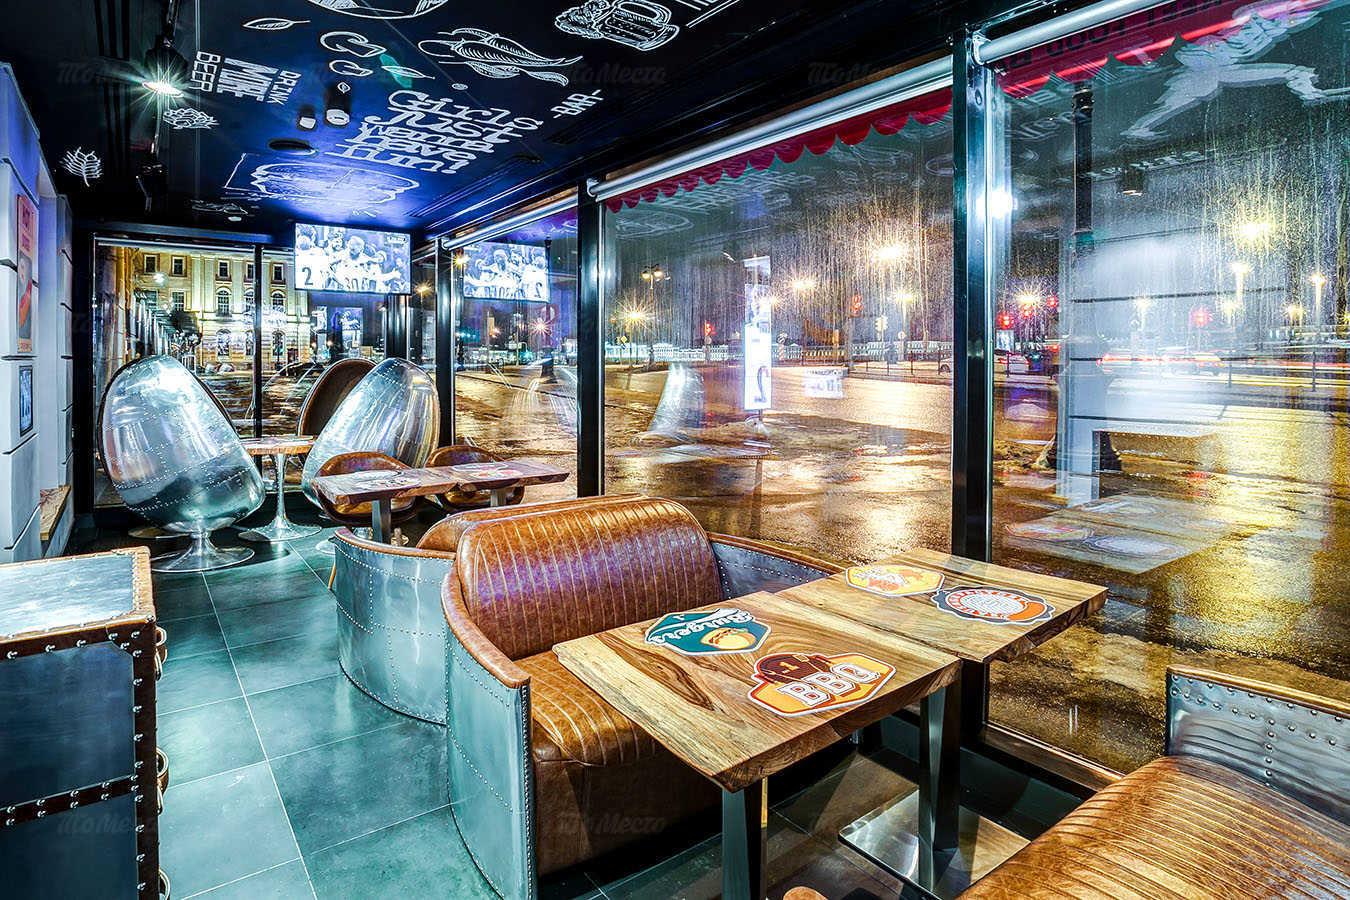 Ресторан Street food bar №1 (Стрит фуд бар №1) на Университетской набережной фото 16